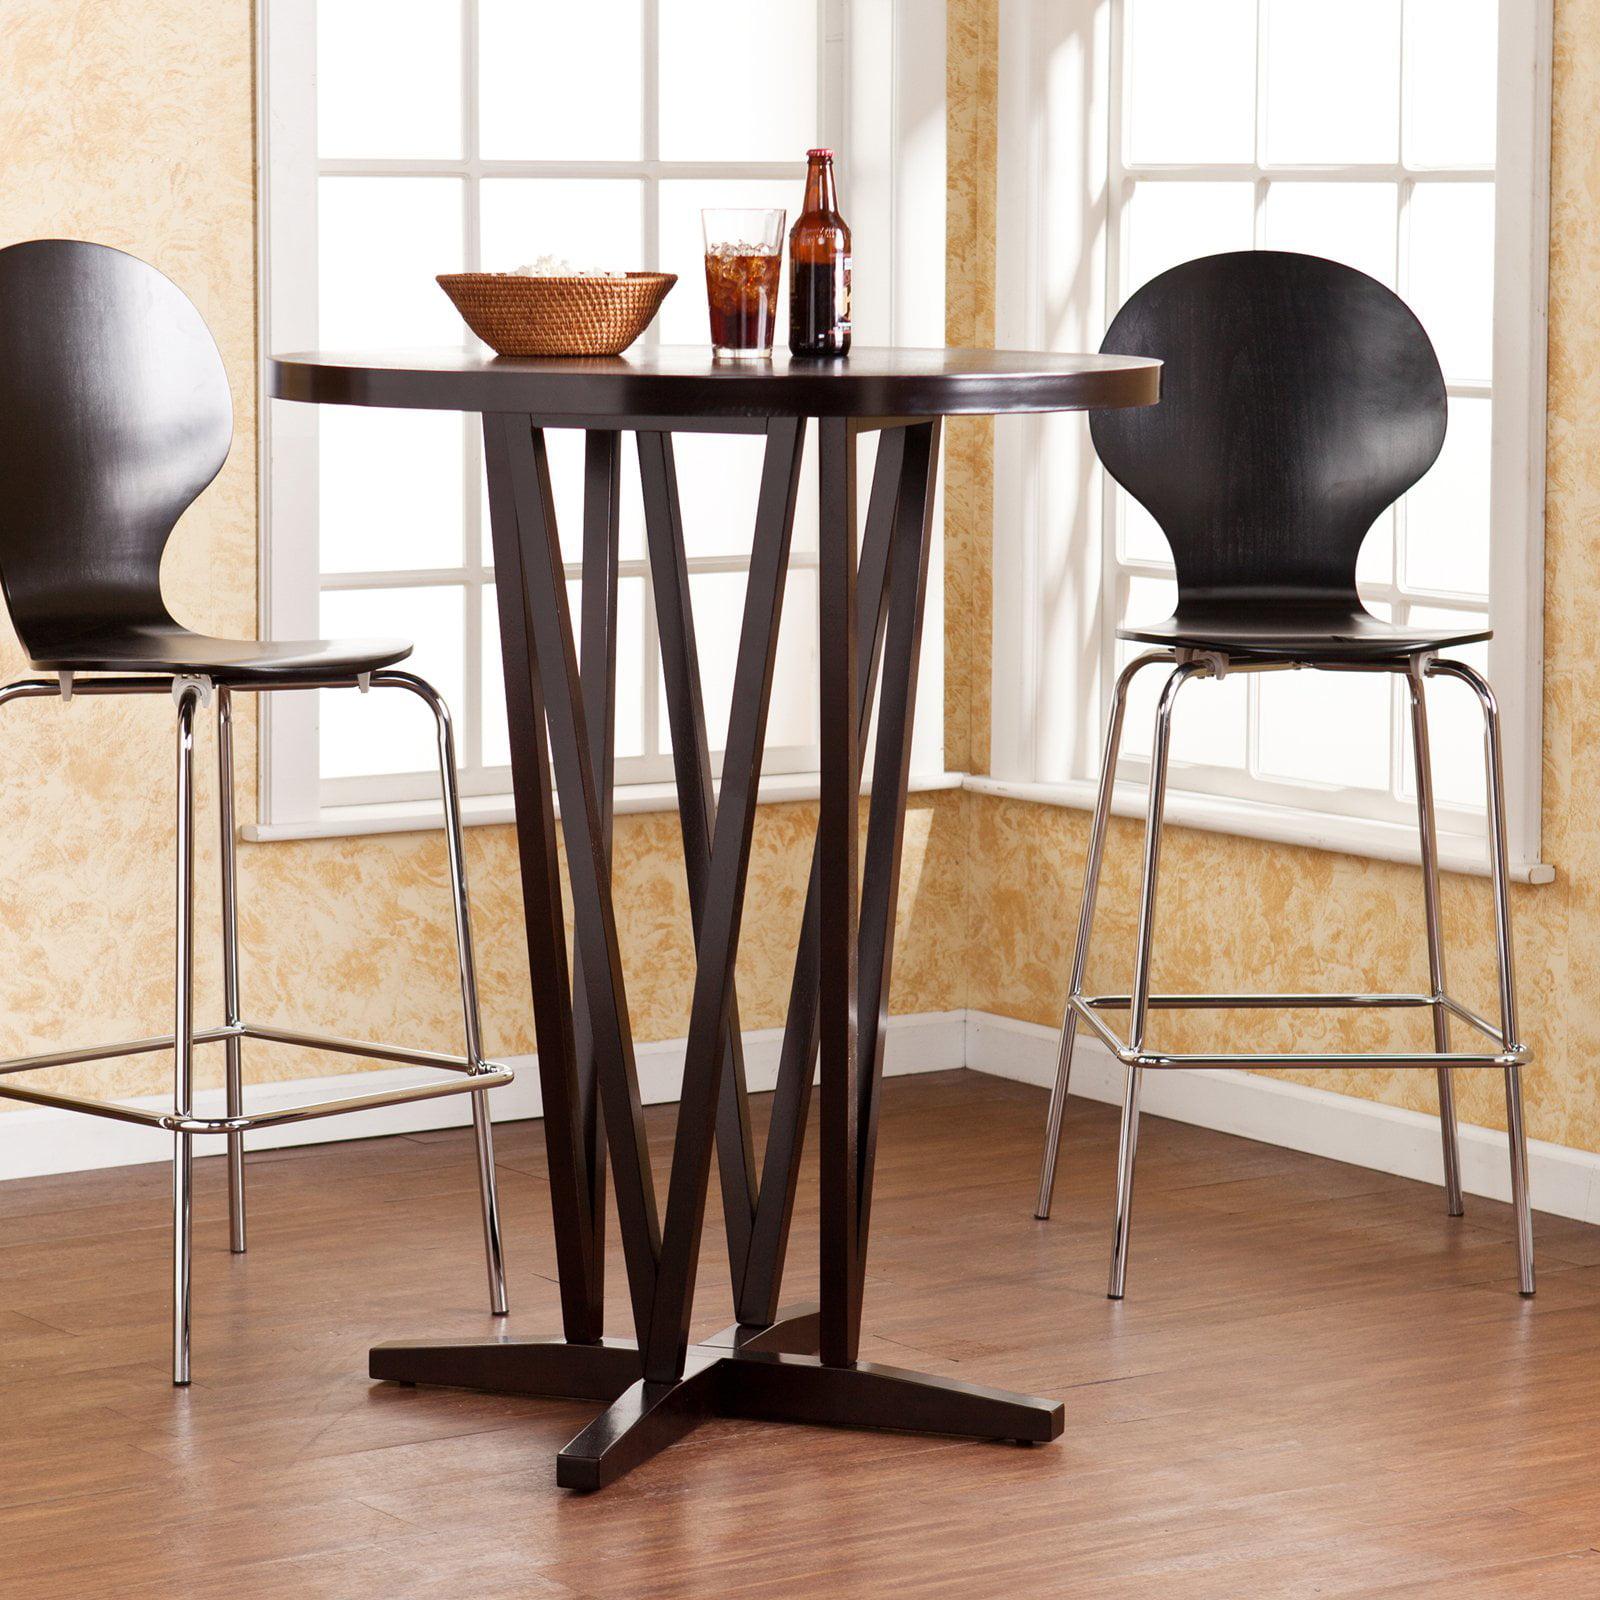 Southern Enterprises Dashwood Bar Table Walmart & Pub Set Table Images - Bar Height Dining Table Set